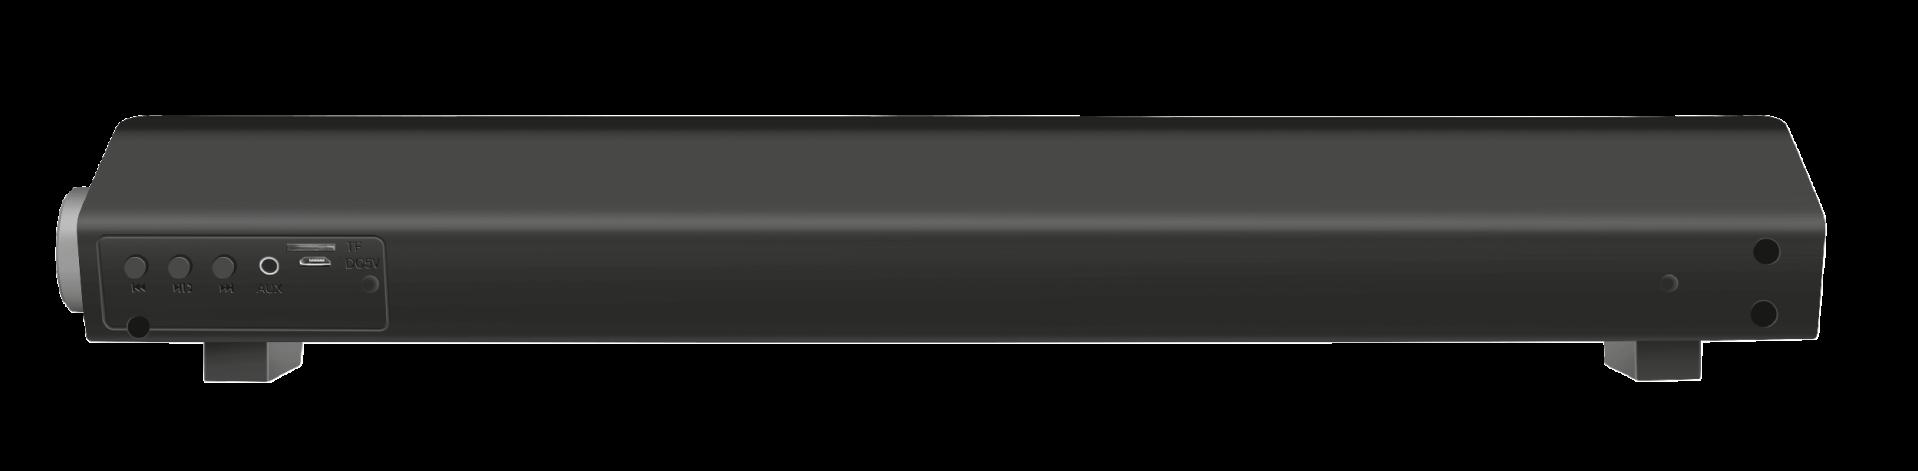 Soundbar Trust Lino WRLS 8713439220155 - 2